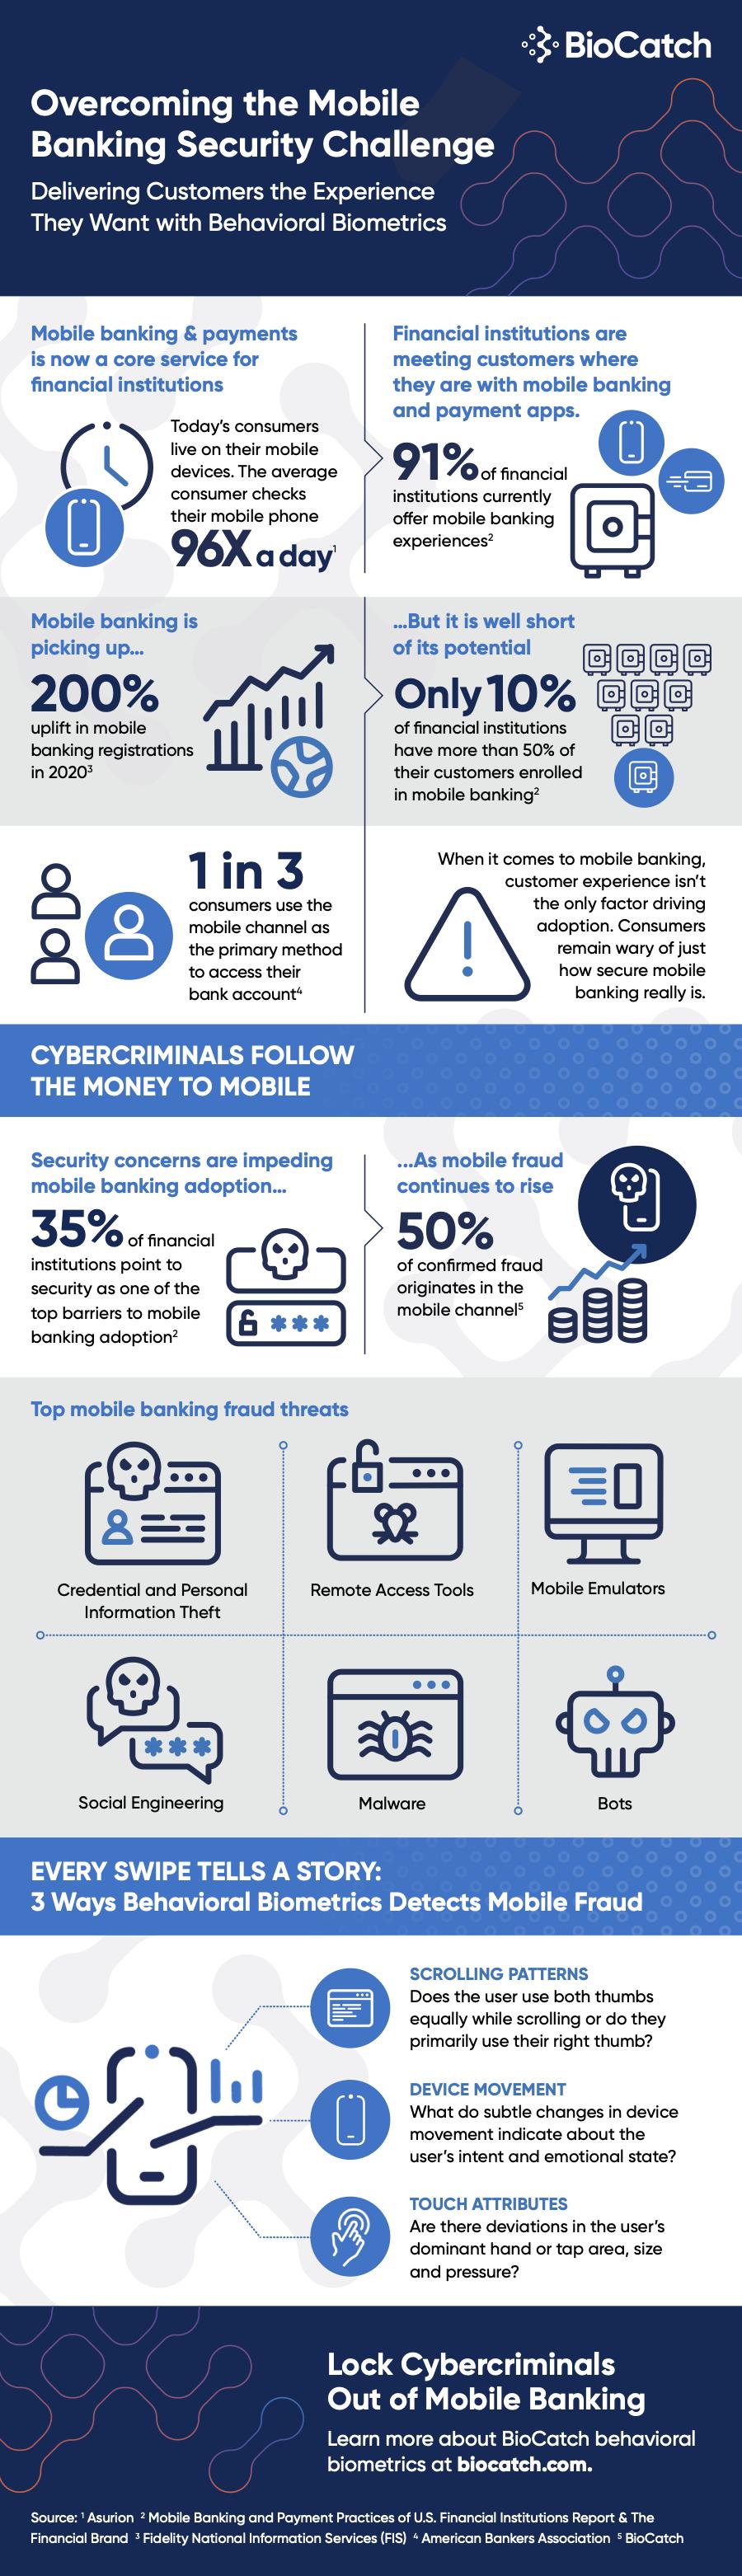 PNGBiocatch-MobileBankingFraud-Infographic (1) (1)